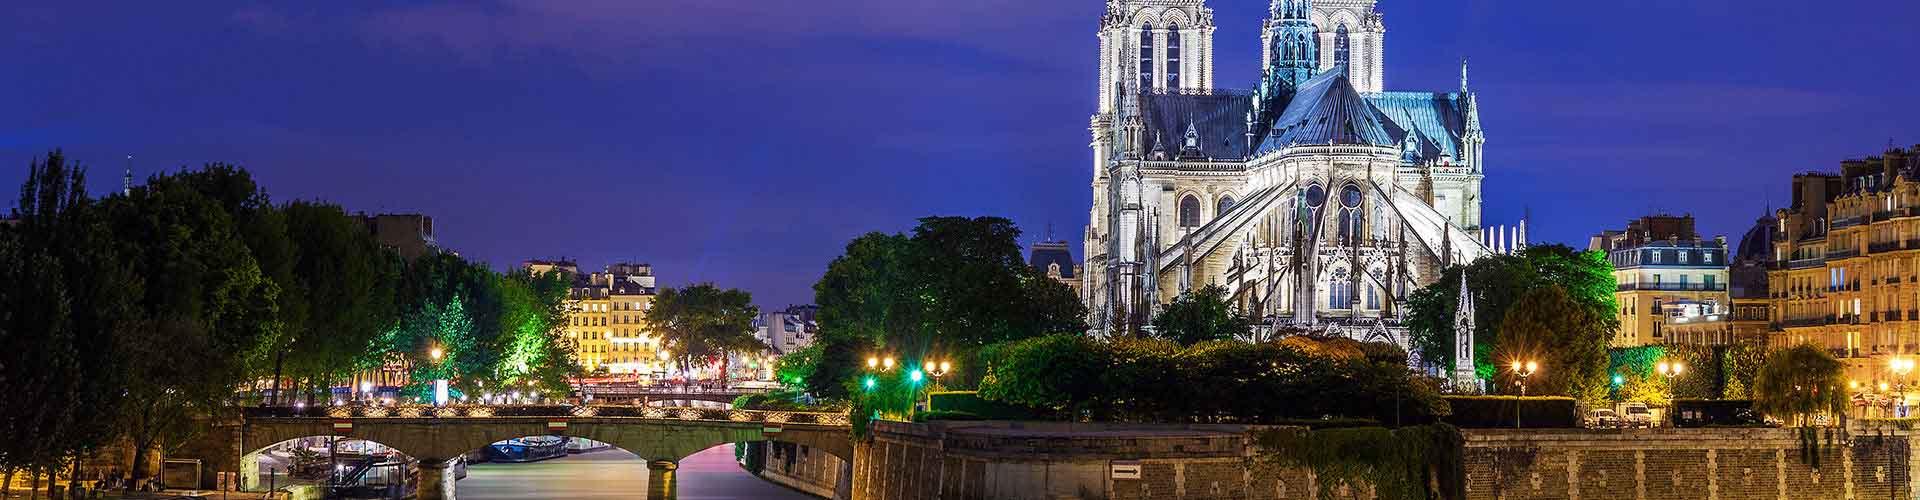 París - Hoteles baratos cerca a Notre Dame de París. Mapas de París, Fotos y comentarios de cada Hotel en París.